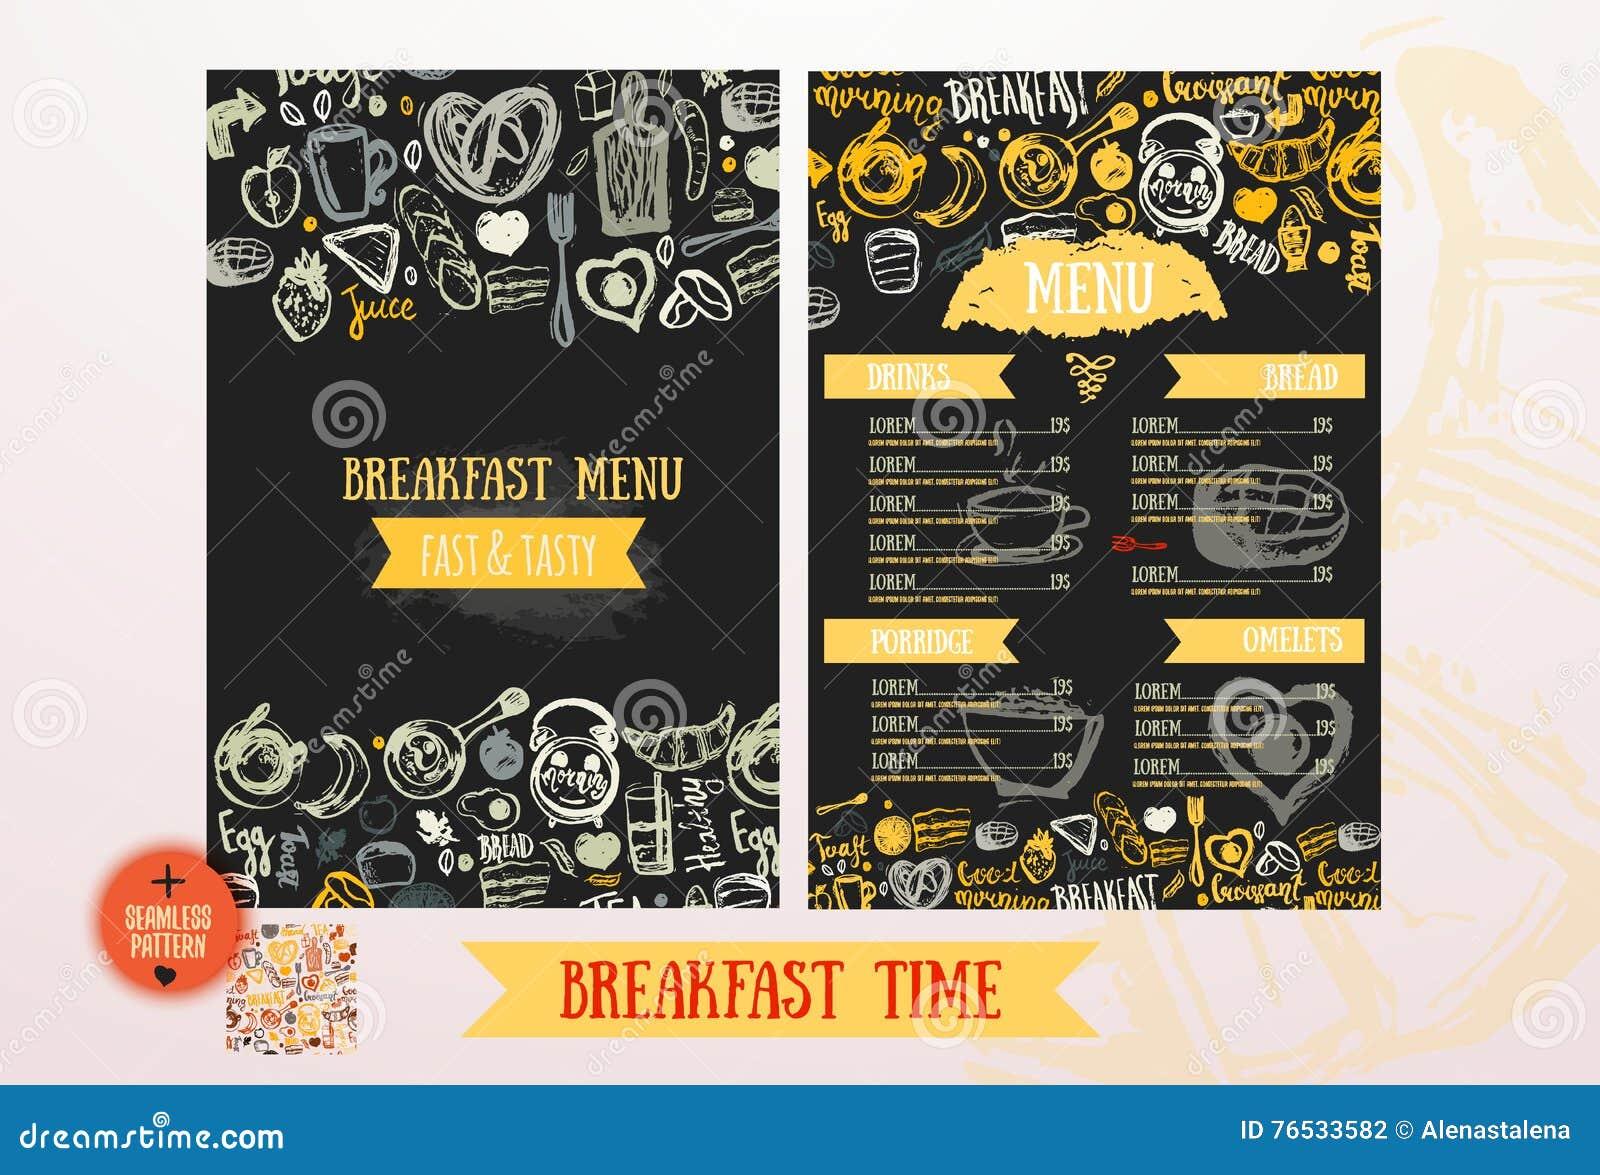 breakfast menu design template. modern hand-drawn sketch with